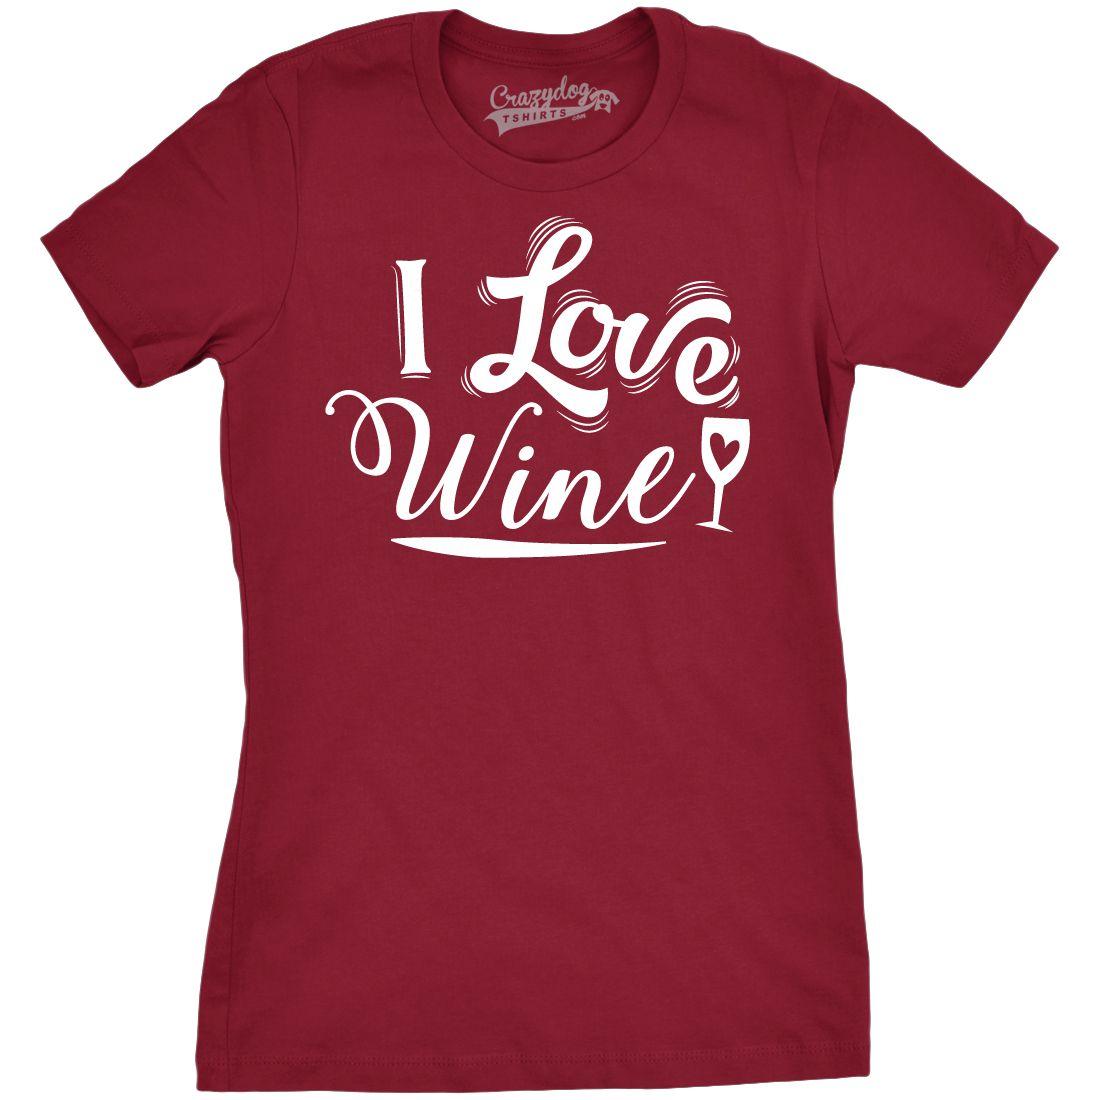 I love wine funny womens tshirt cool cute mom drinking